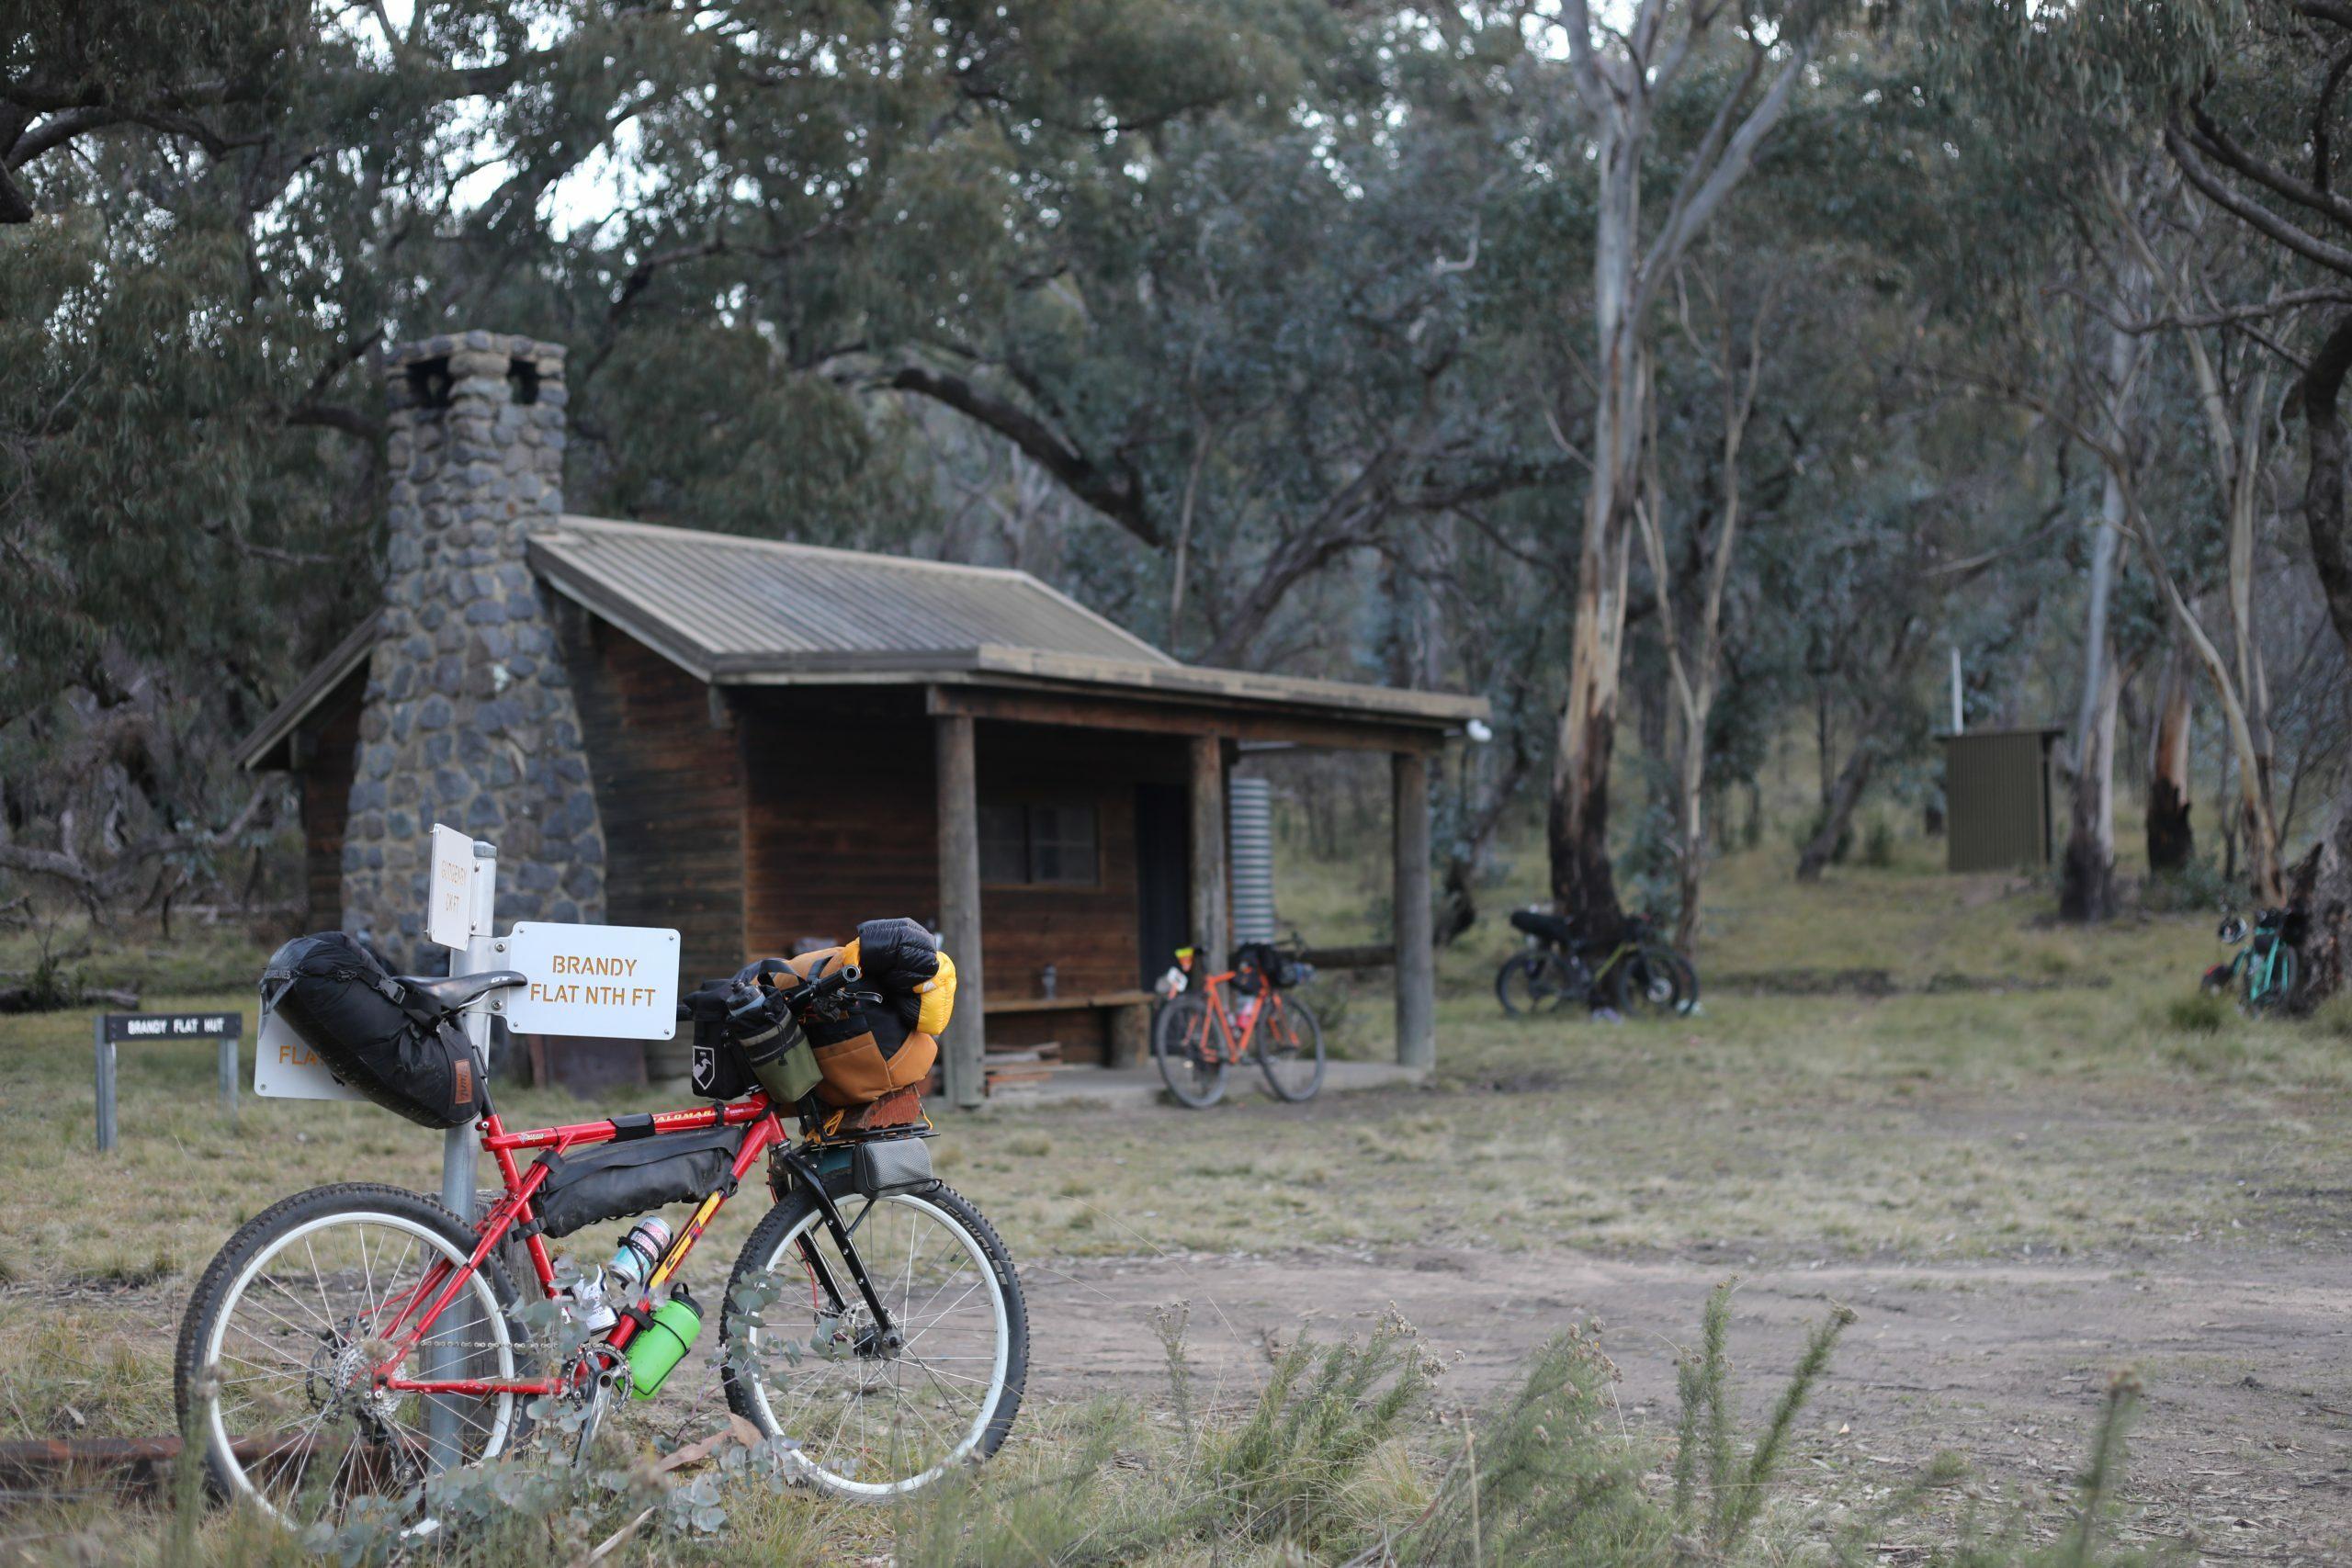 Bikepacking bike at Brandy Flat Hut